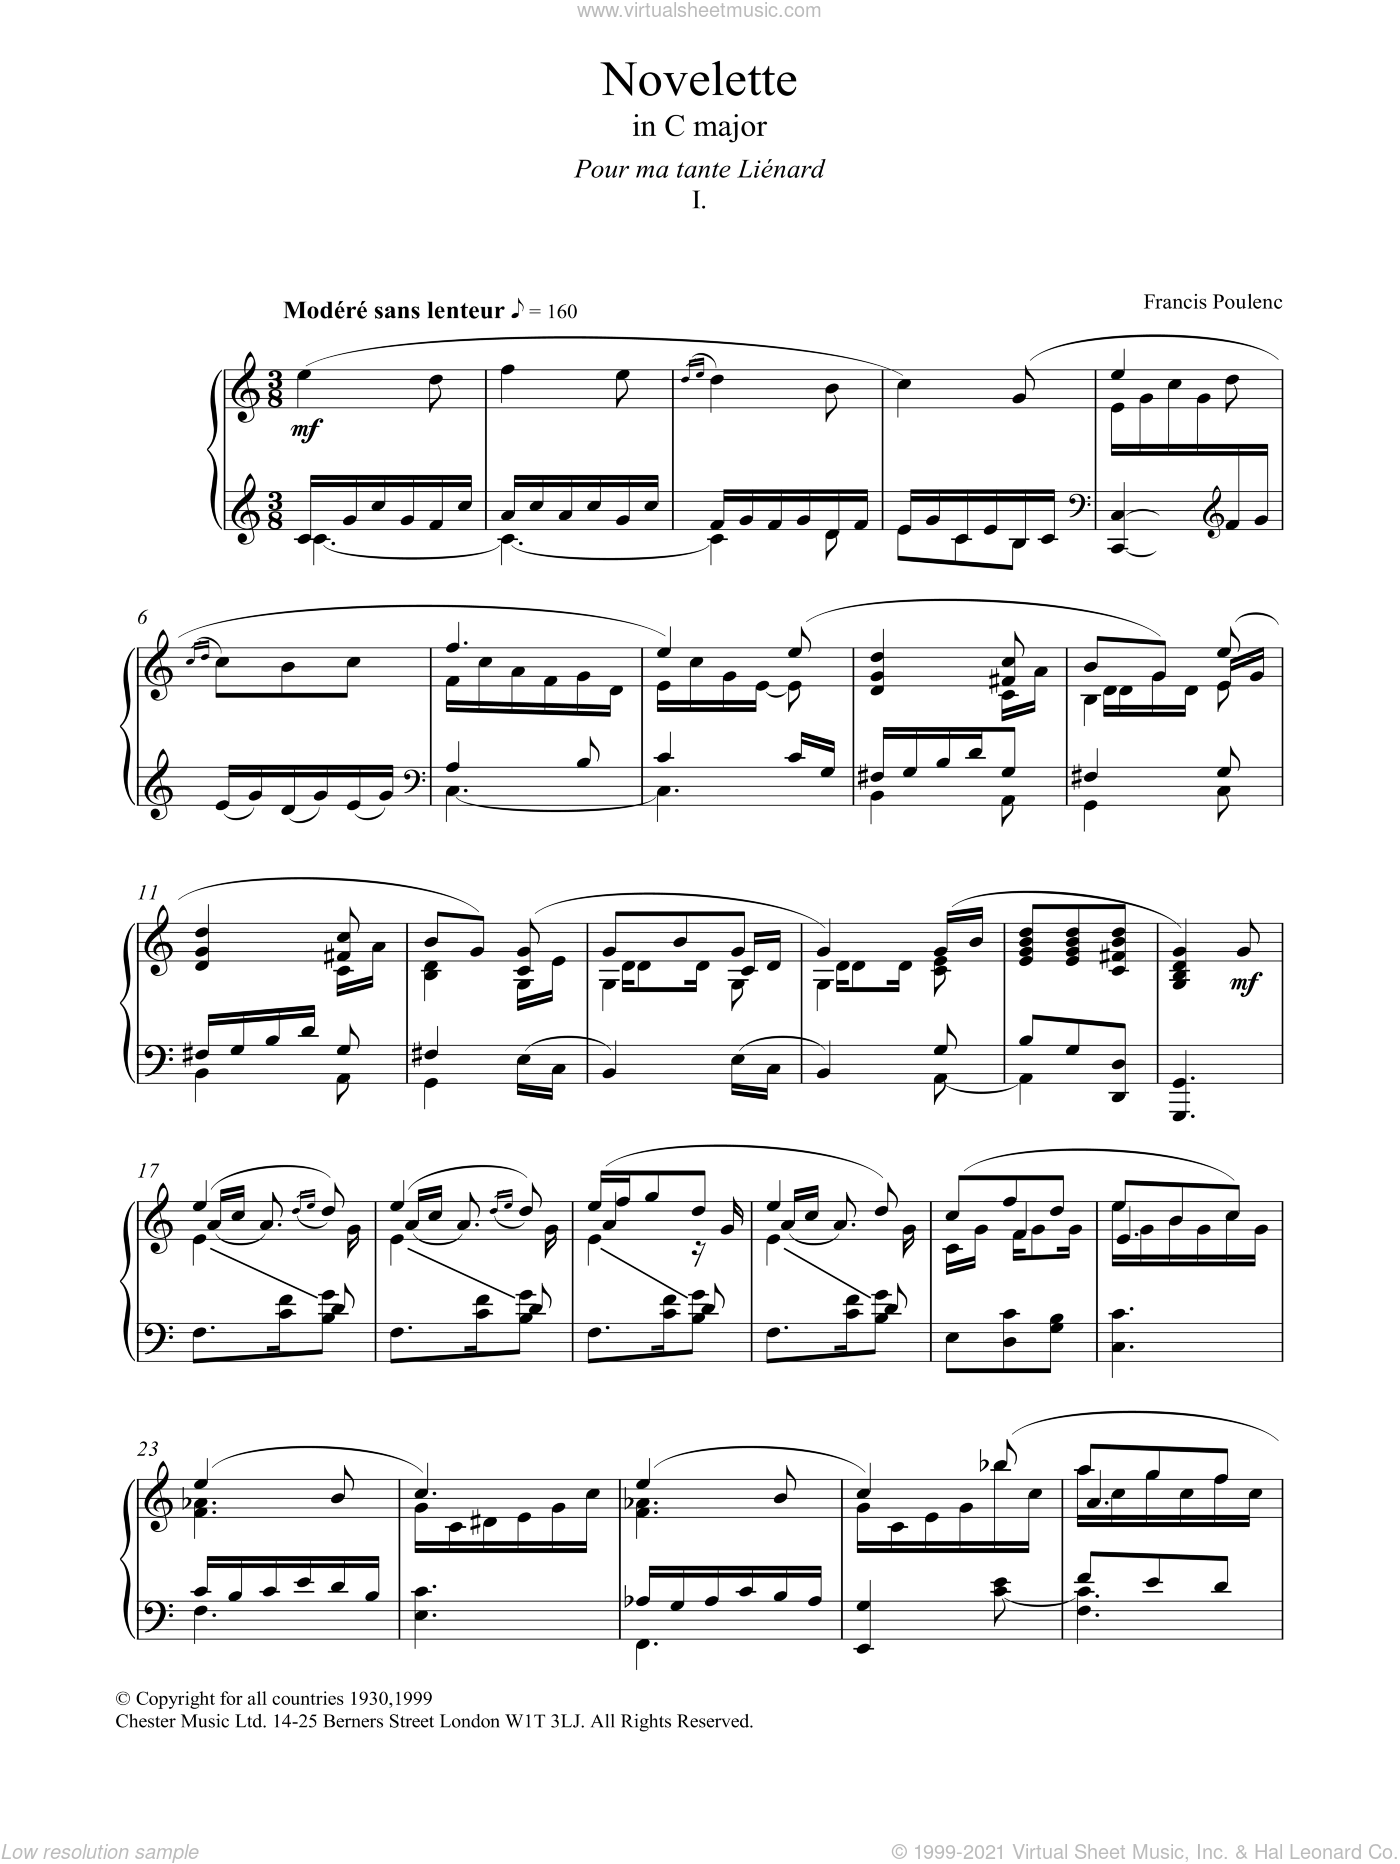 Novelette In C Major, I sheet music for piano solo by Francis Poulenc, classical score, intermediate skill level